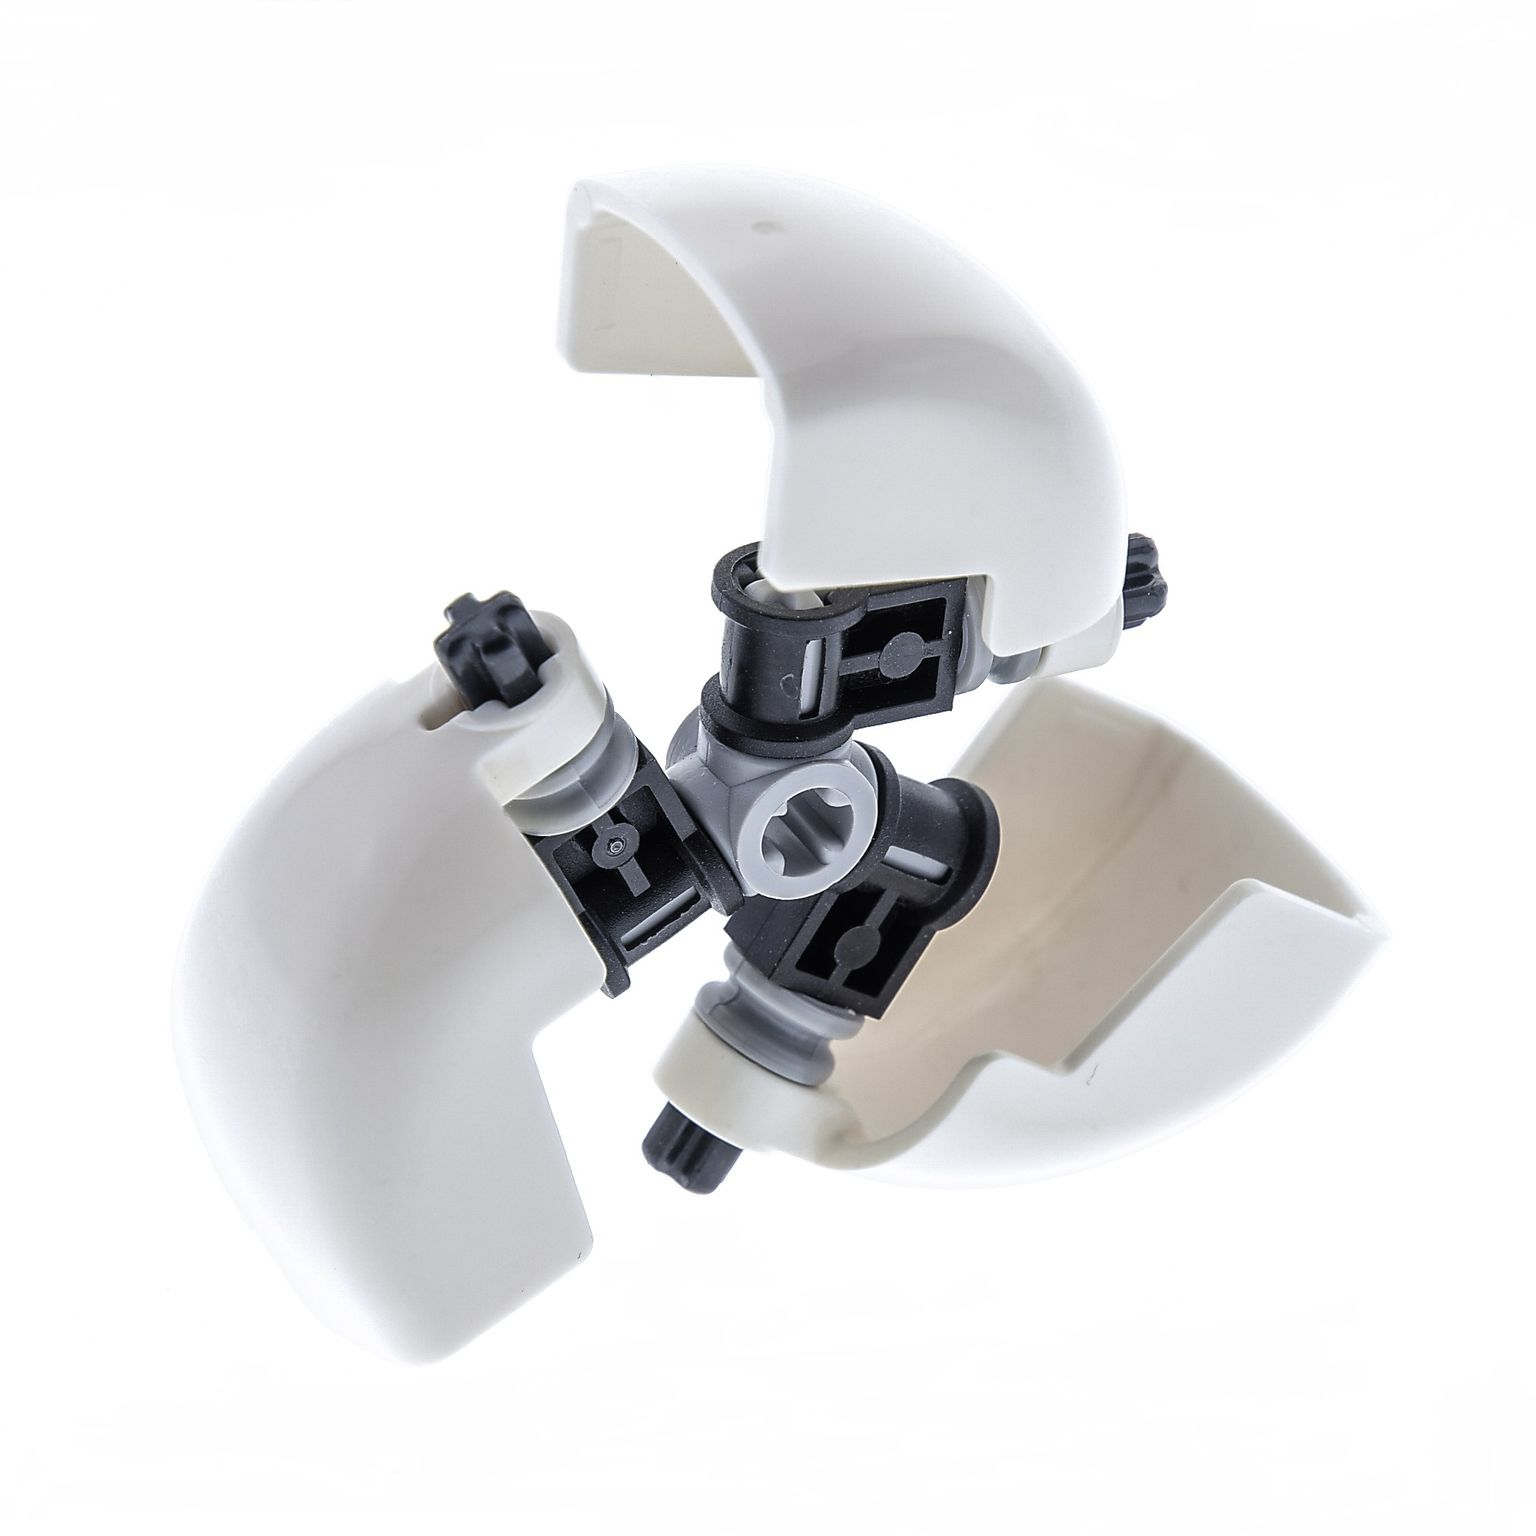 1 x Lego Bionicle Figur Maske weiss für Technic Schaufel 7645 4528414 57702